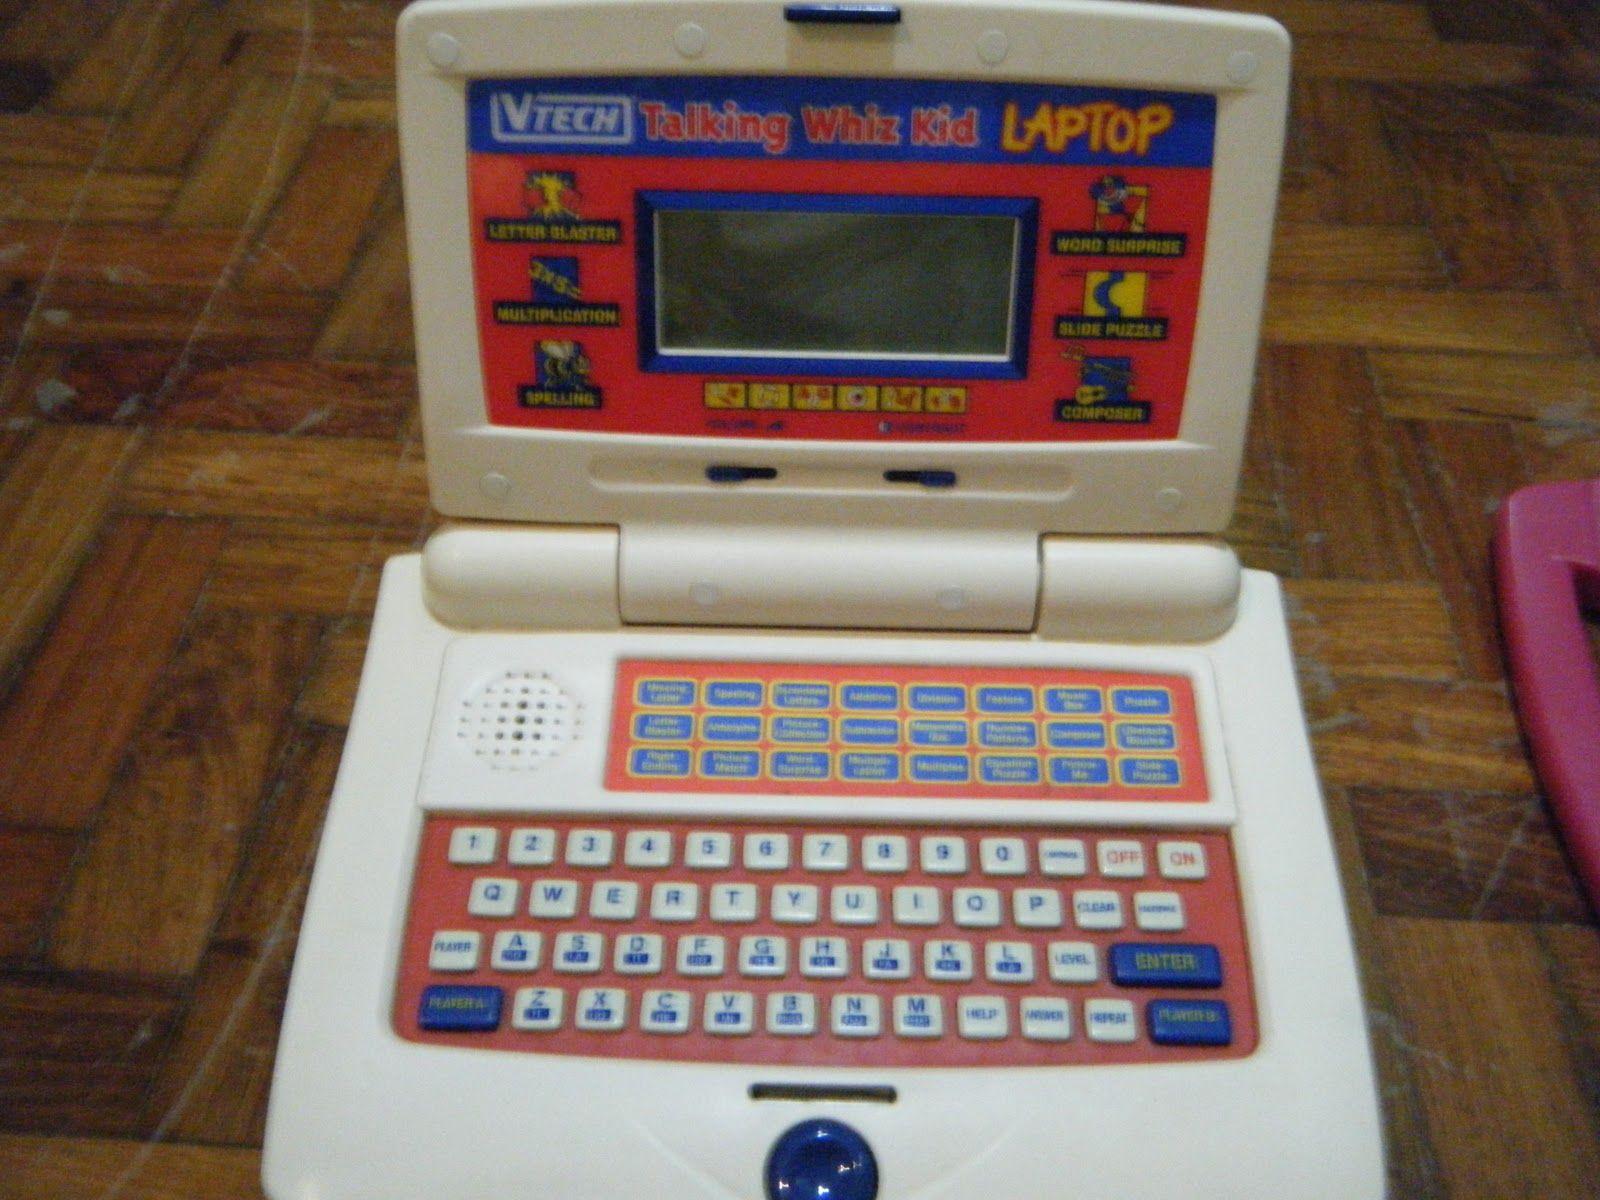 Talking WHIZ KID Laptop by Vtech